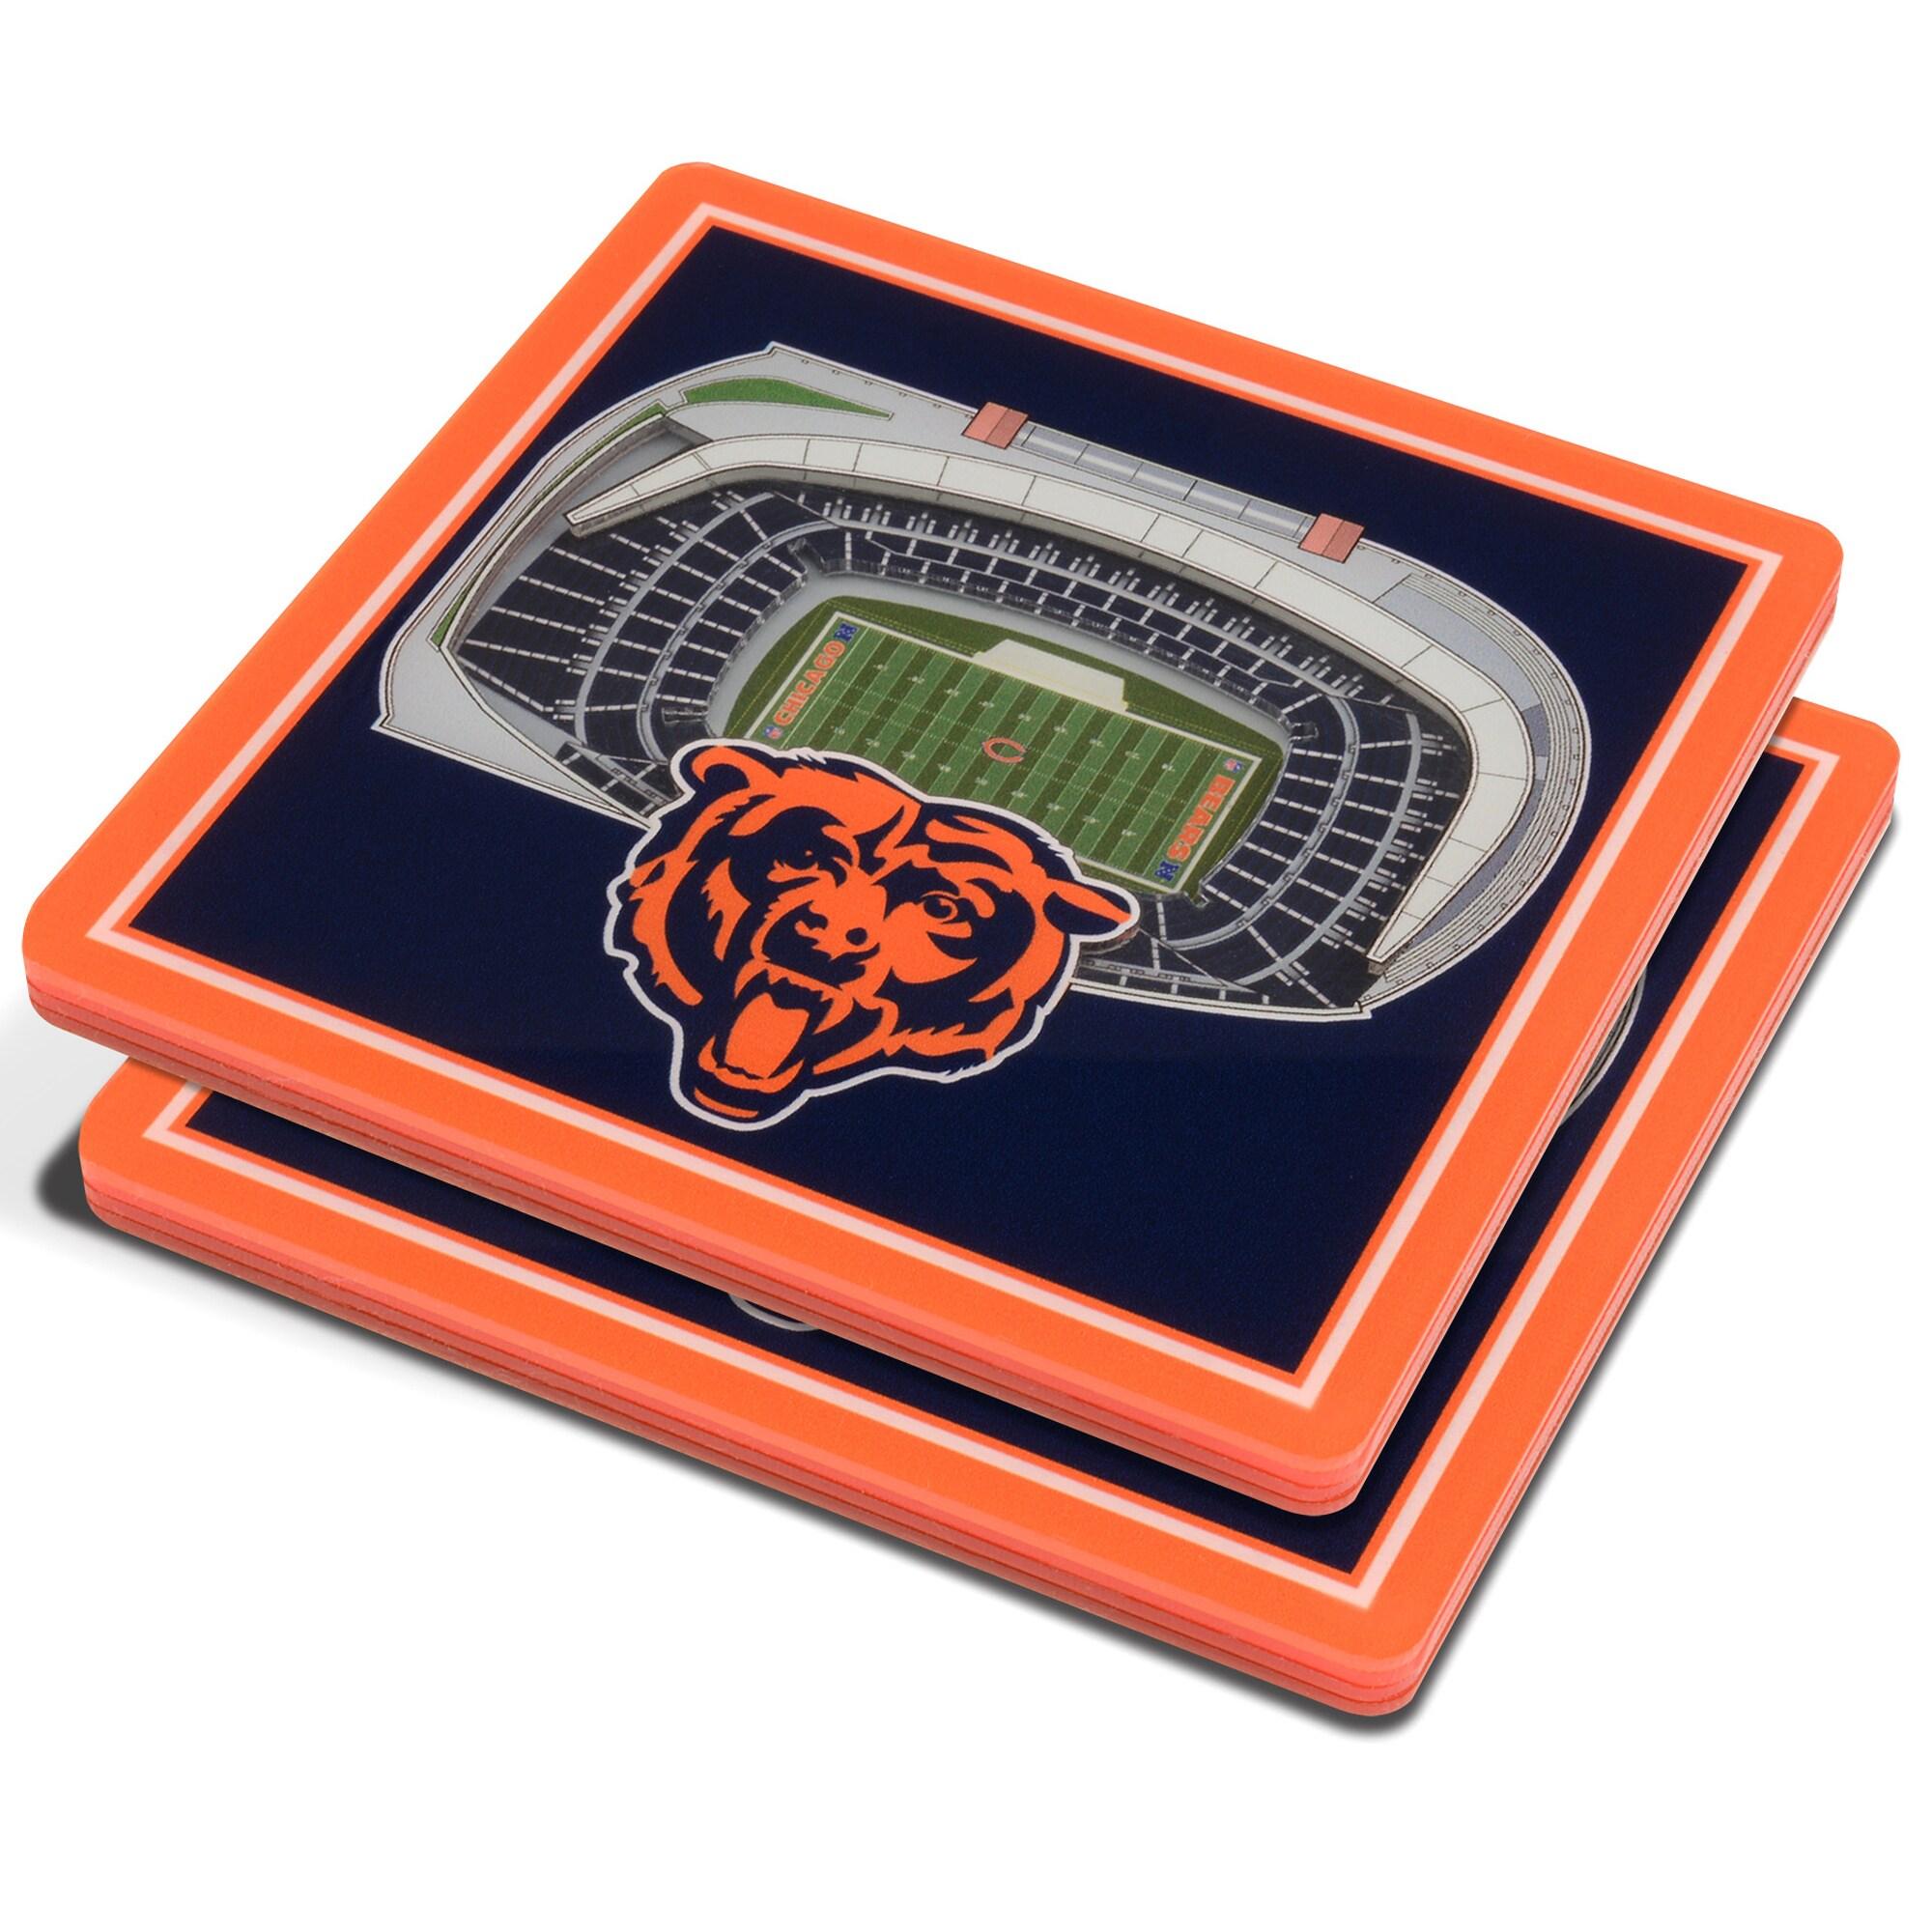 Chicago Bears 3D StadiumViews Coasters - Blue